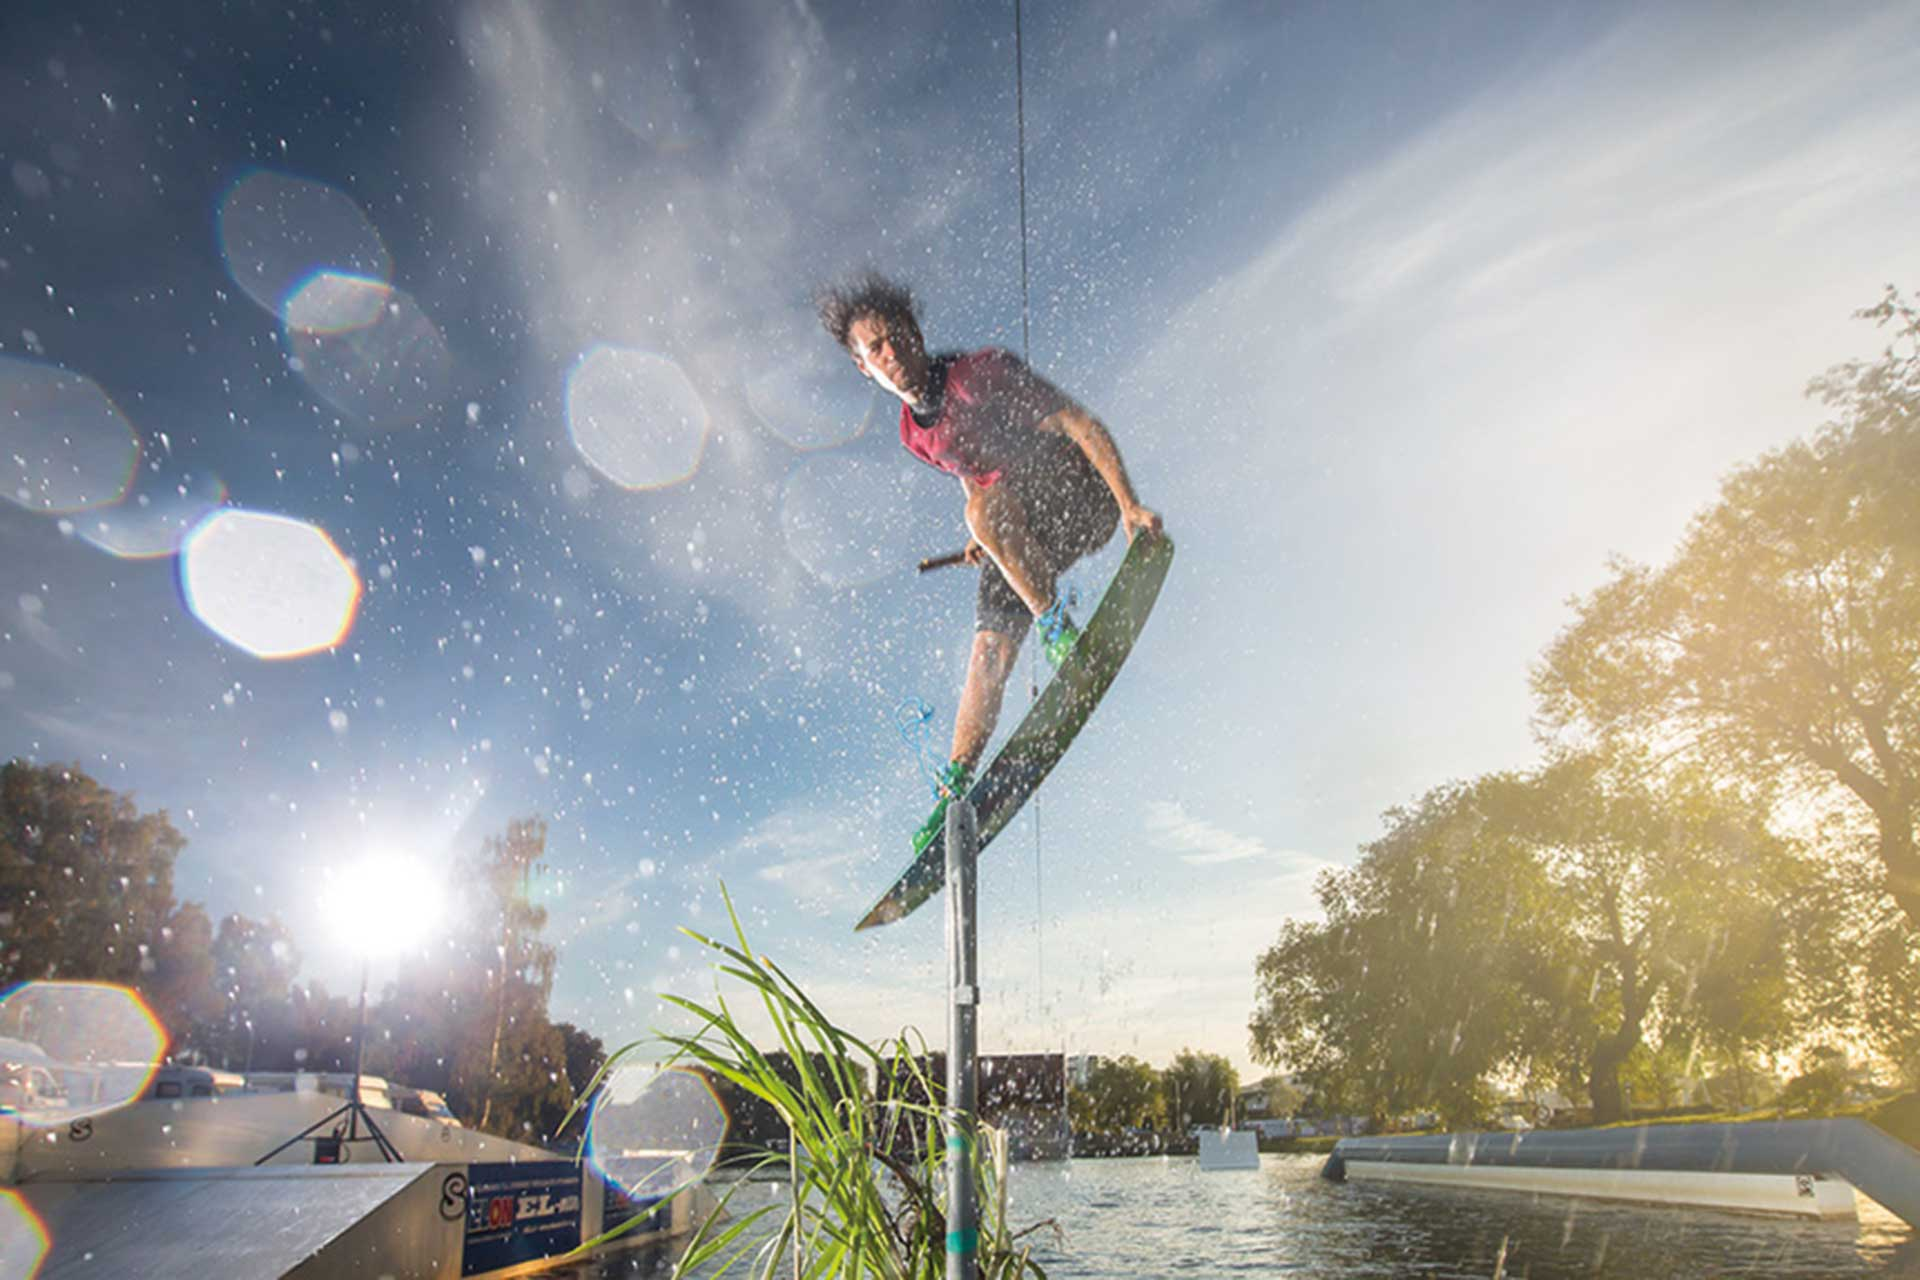 Man hoppar med wakeboard i Västerås Cable park.